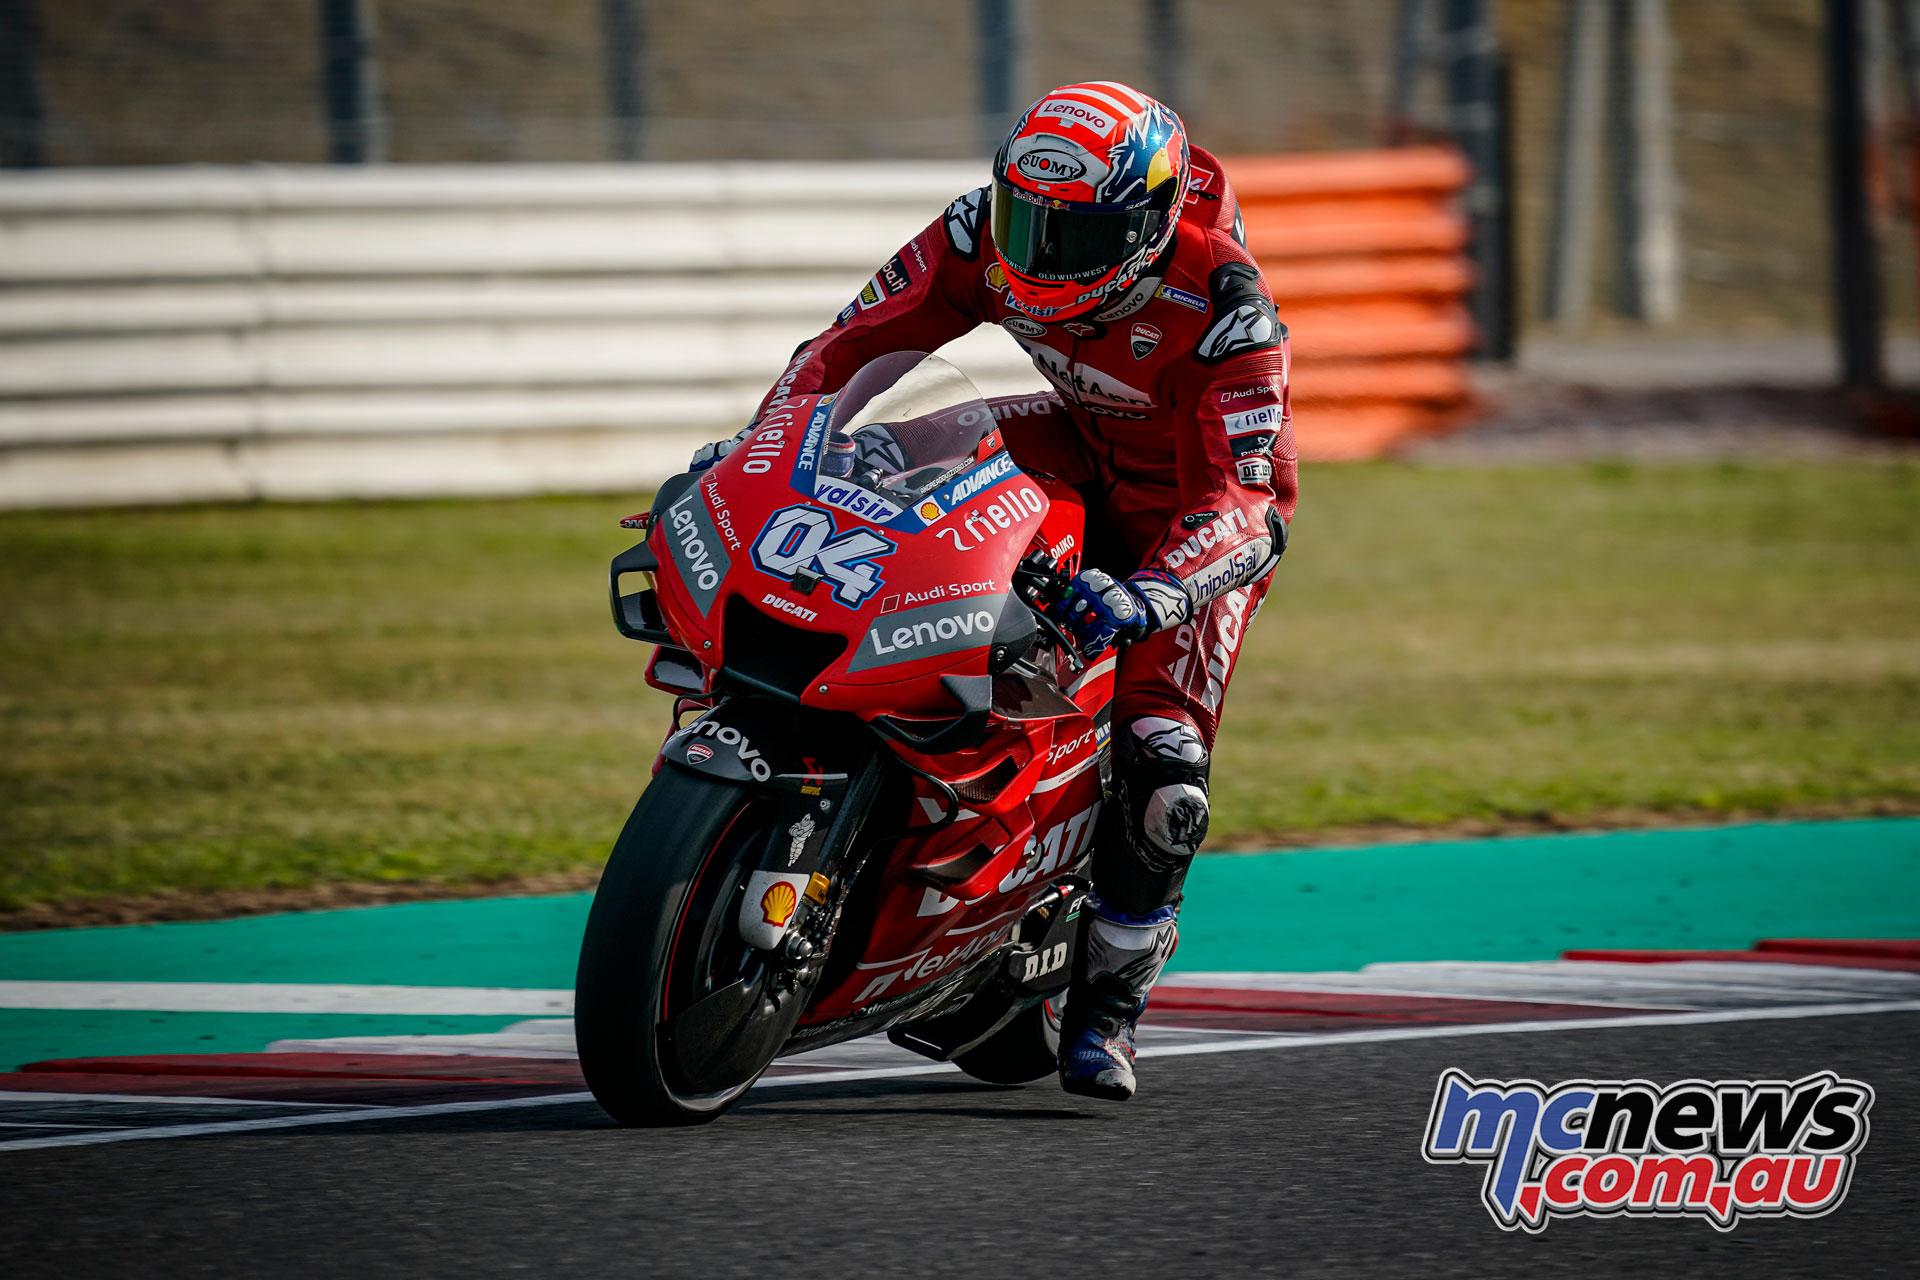 MotoGP Test Misano D Andrea Dovizioso